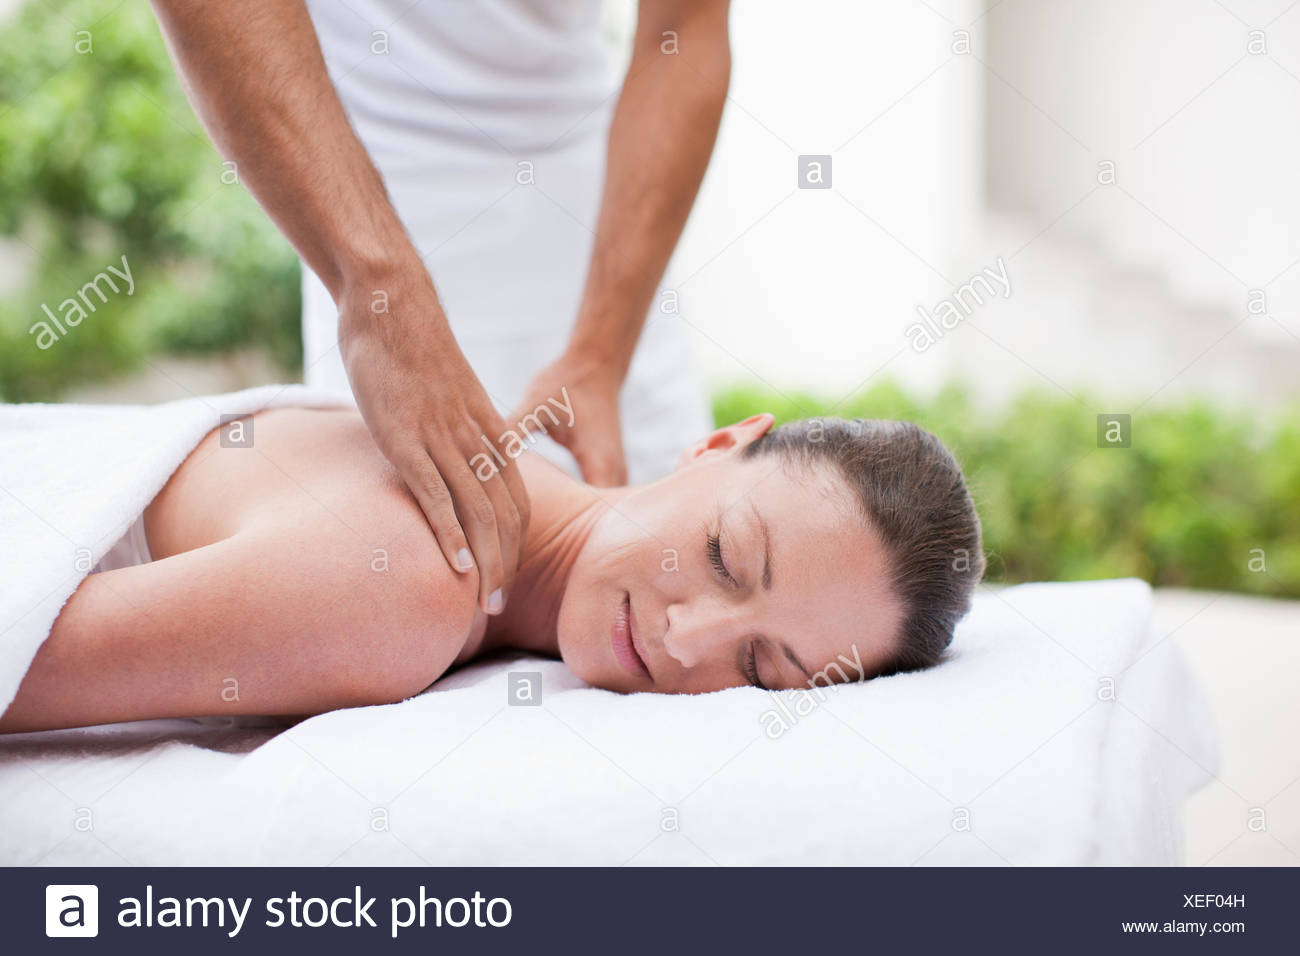 Woman receiving massage - Stock Image